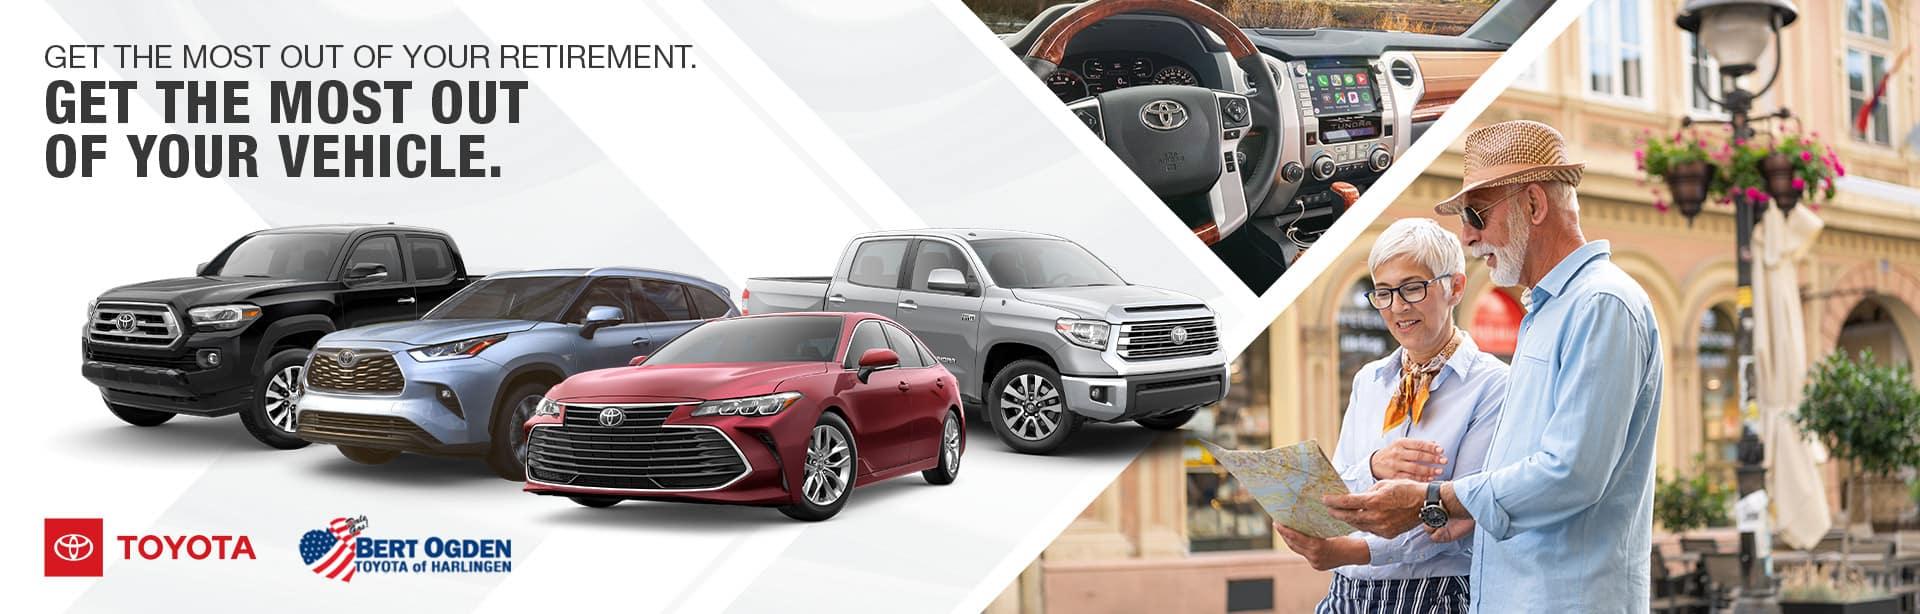 Toyota Models for Winter Texans | Bert Ogden Toyota | Harlingen, TX